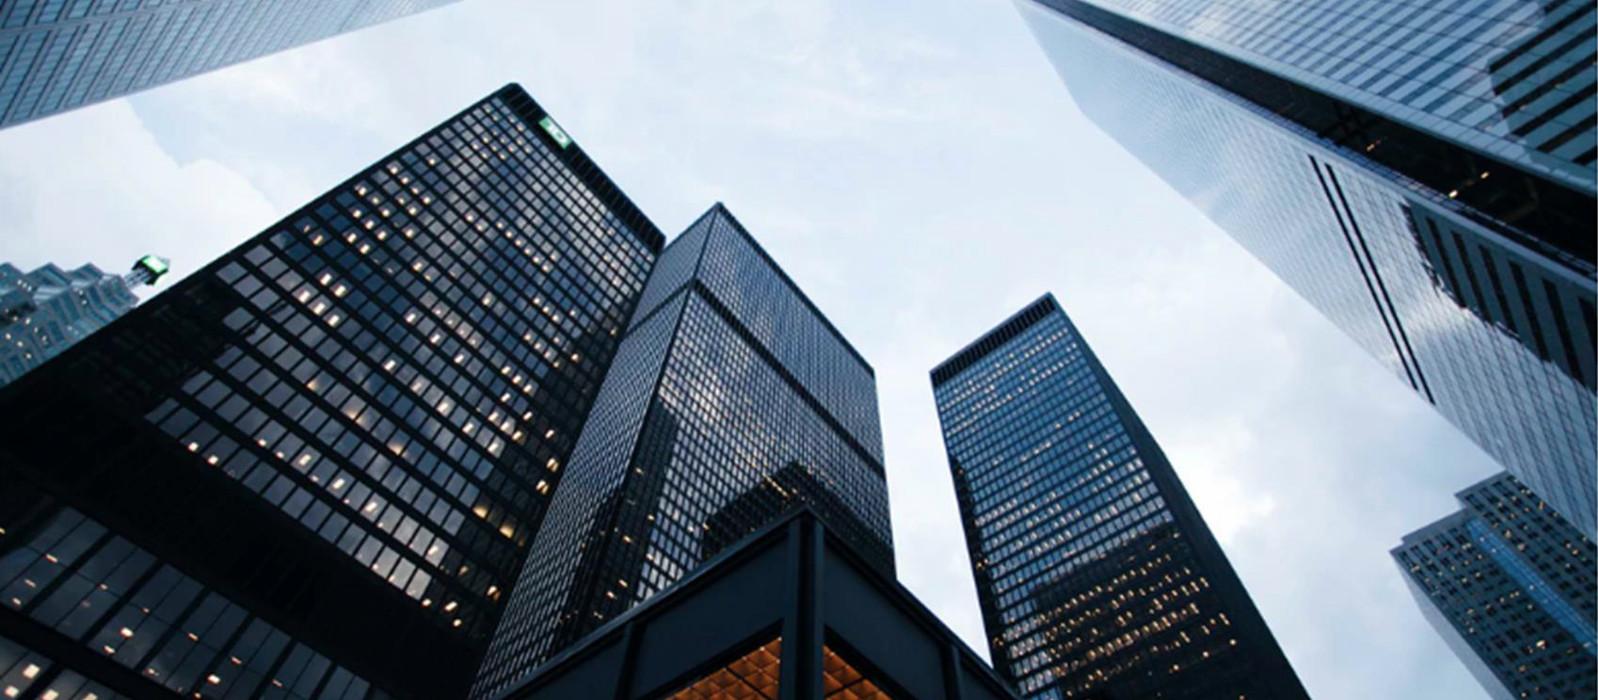 Somos representantes de Antuar,</br>líder global en automatización de sucursales bancarias.